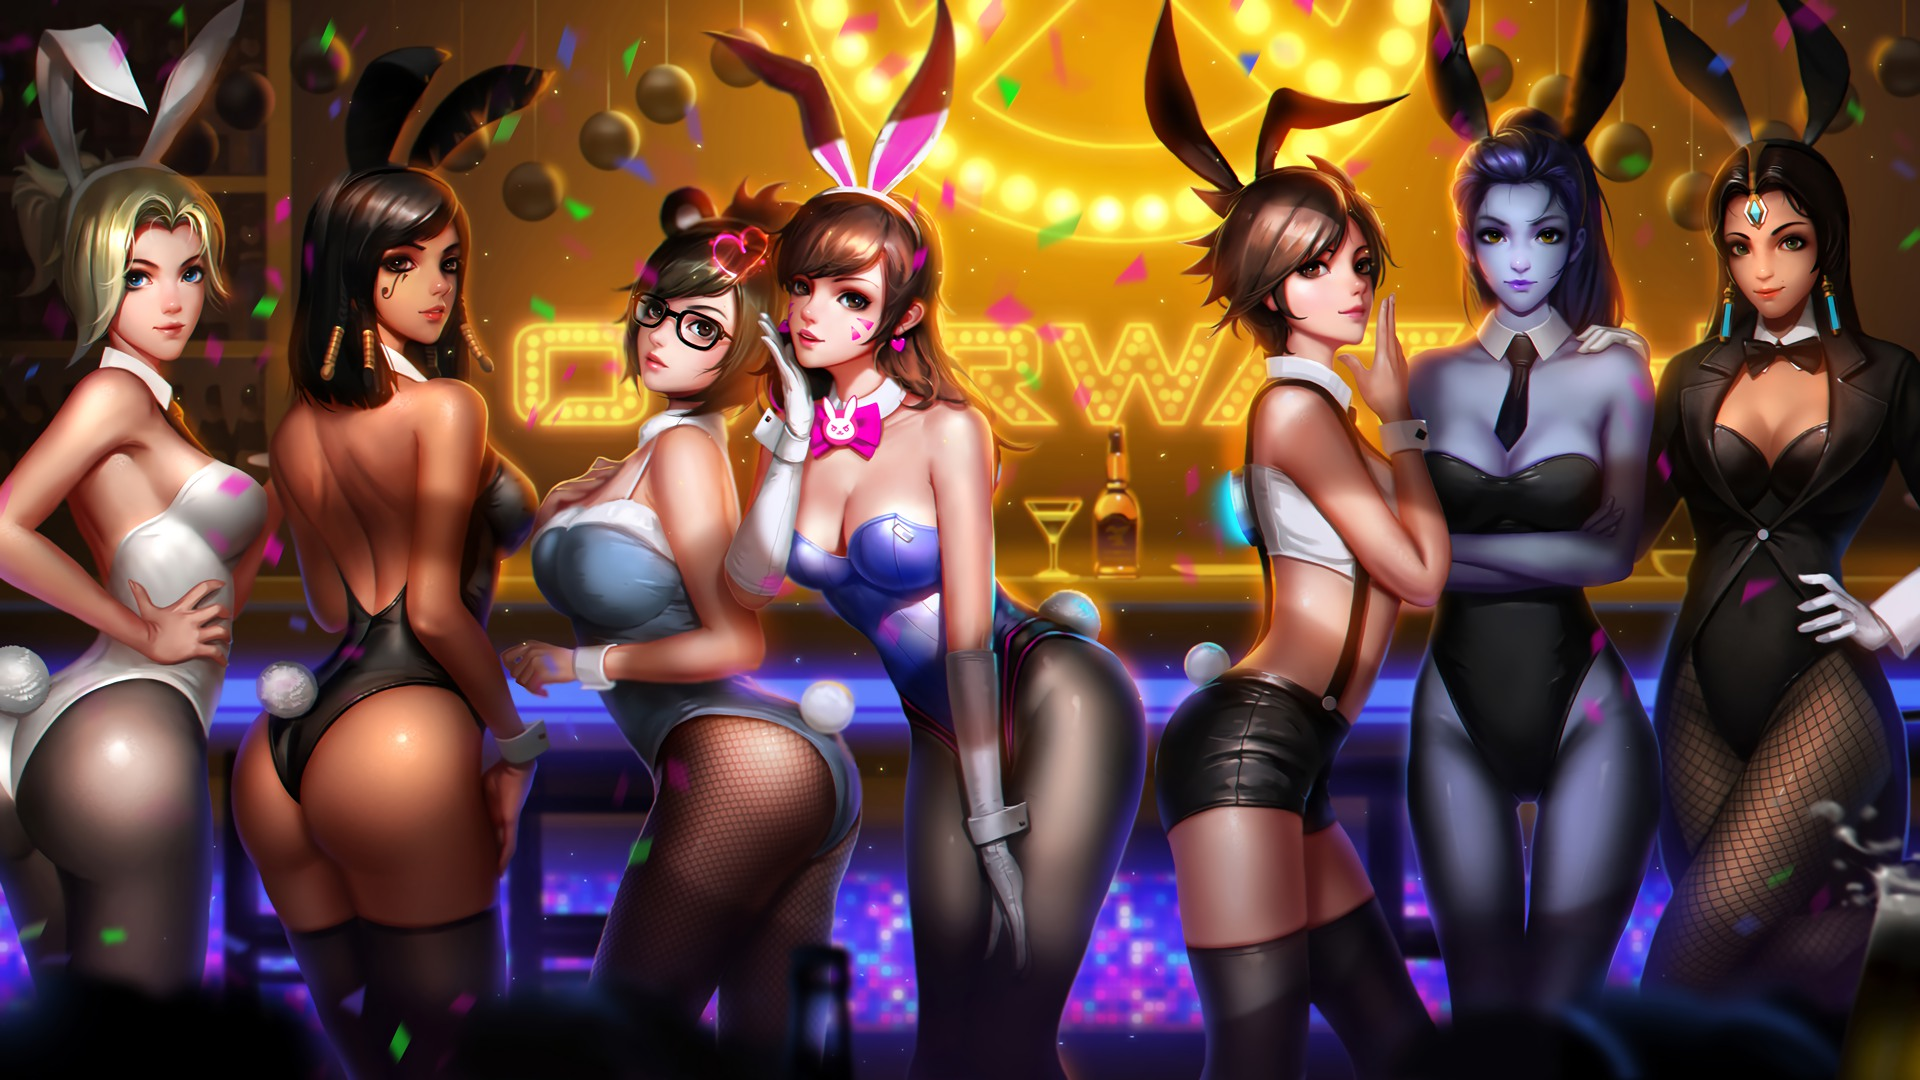 General 1920x1080 Overwatch Anniversary Overwatch Mercy (Overwatch) Pharah (Overwatch) Mei (Overwatch) D.Va (Overwatch) Tracer (Overwatch) Widowmaker (Overwatch) Symmetra (Overwatch) video game girls